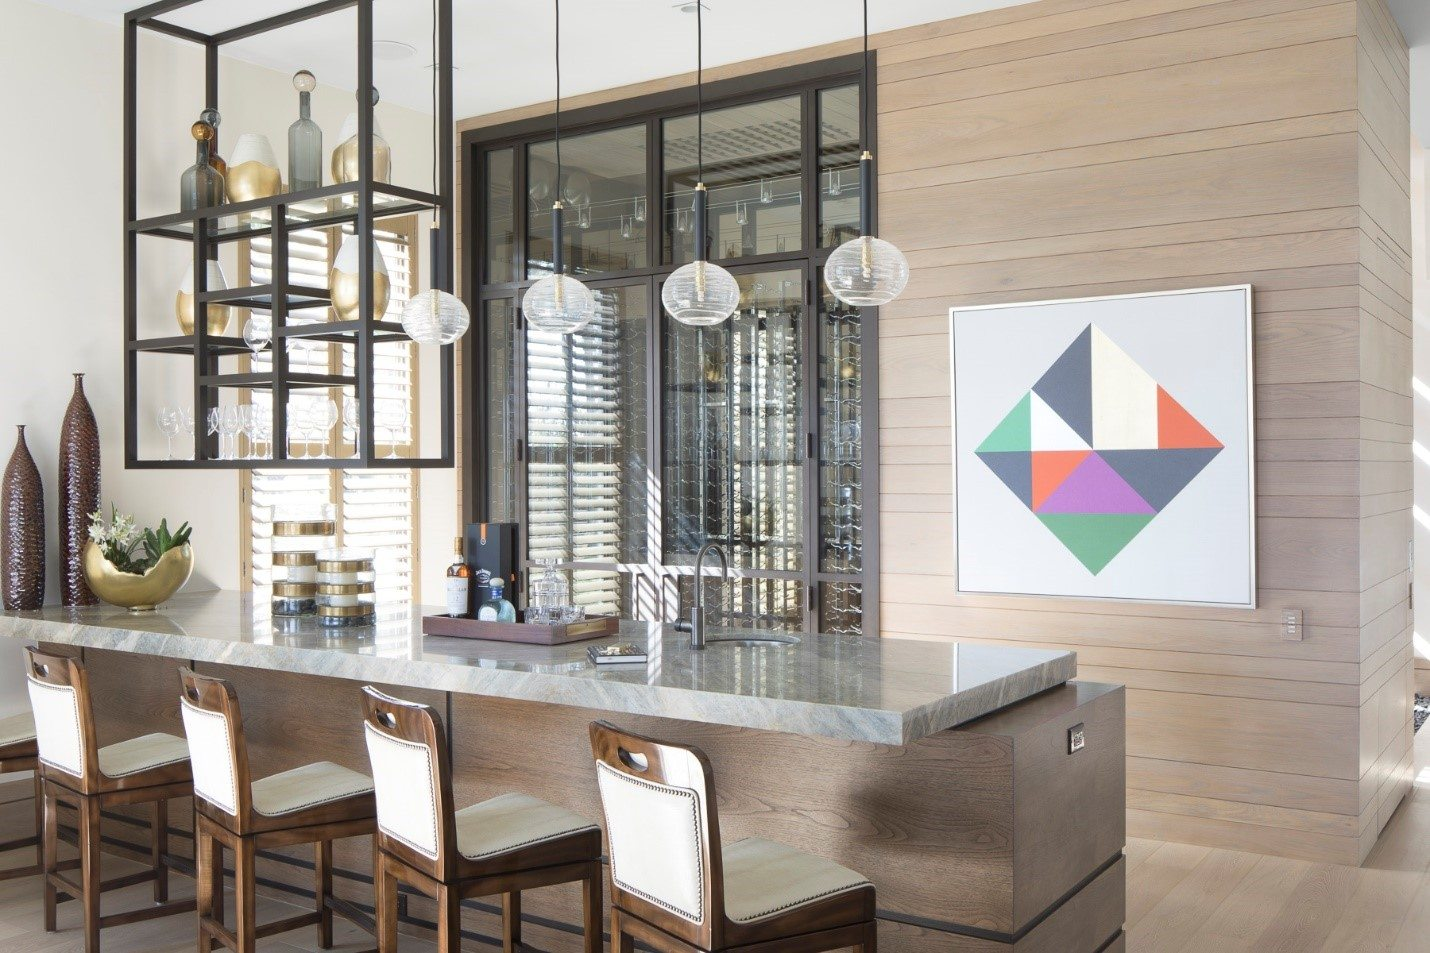 Mastering A Luxury Neutral Interior Design Aesthetic | Marc-Michaels